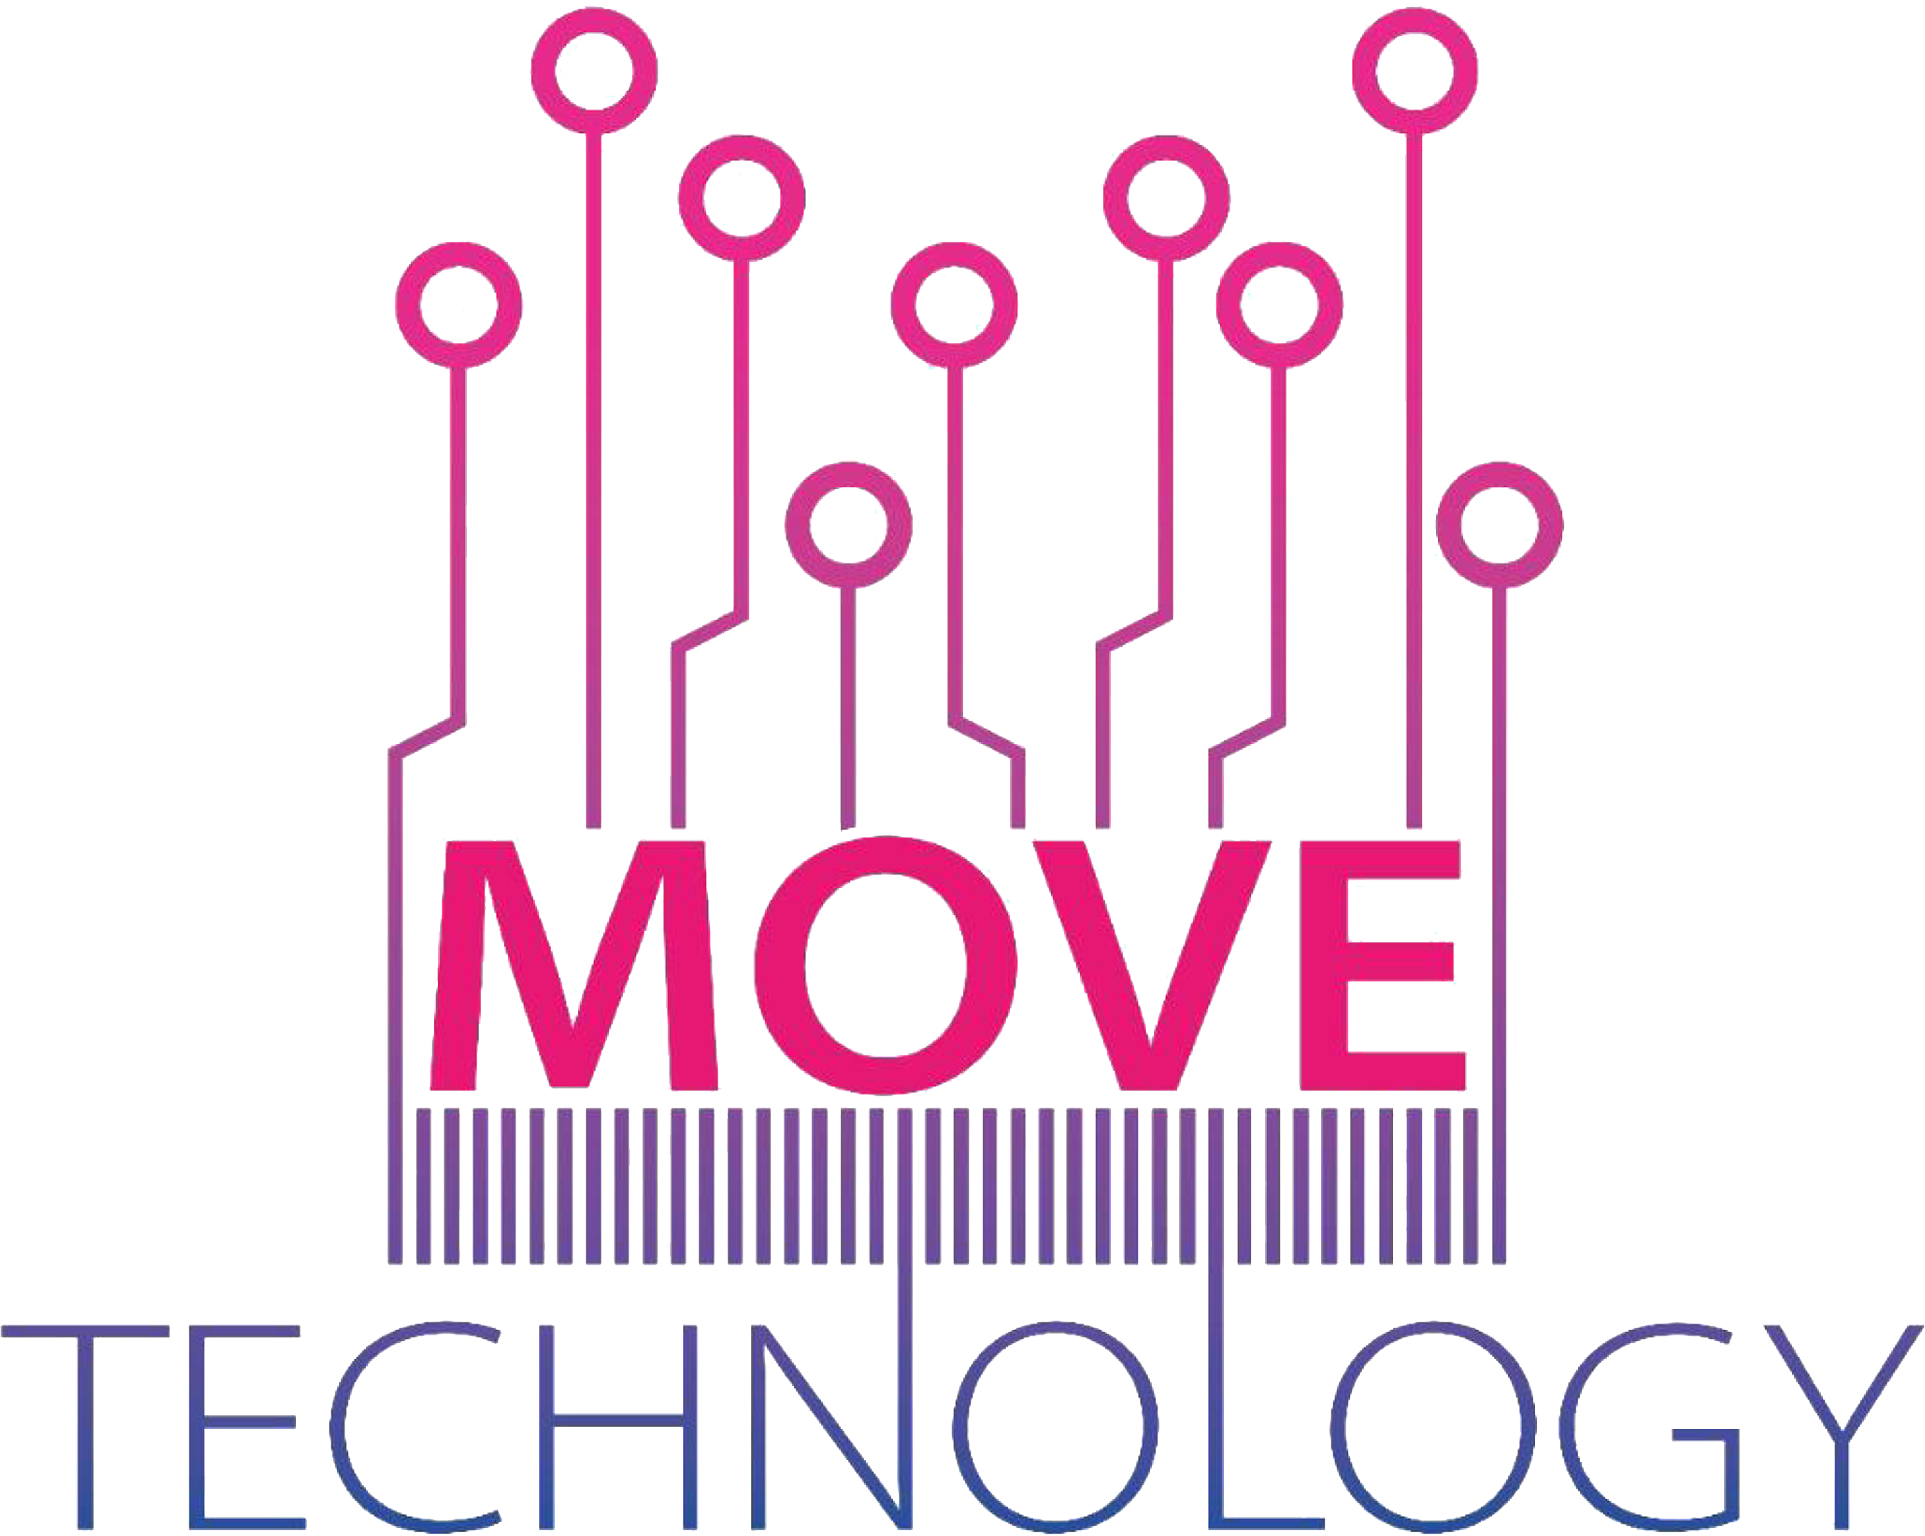 Move Technologies